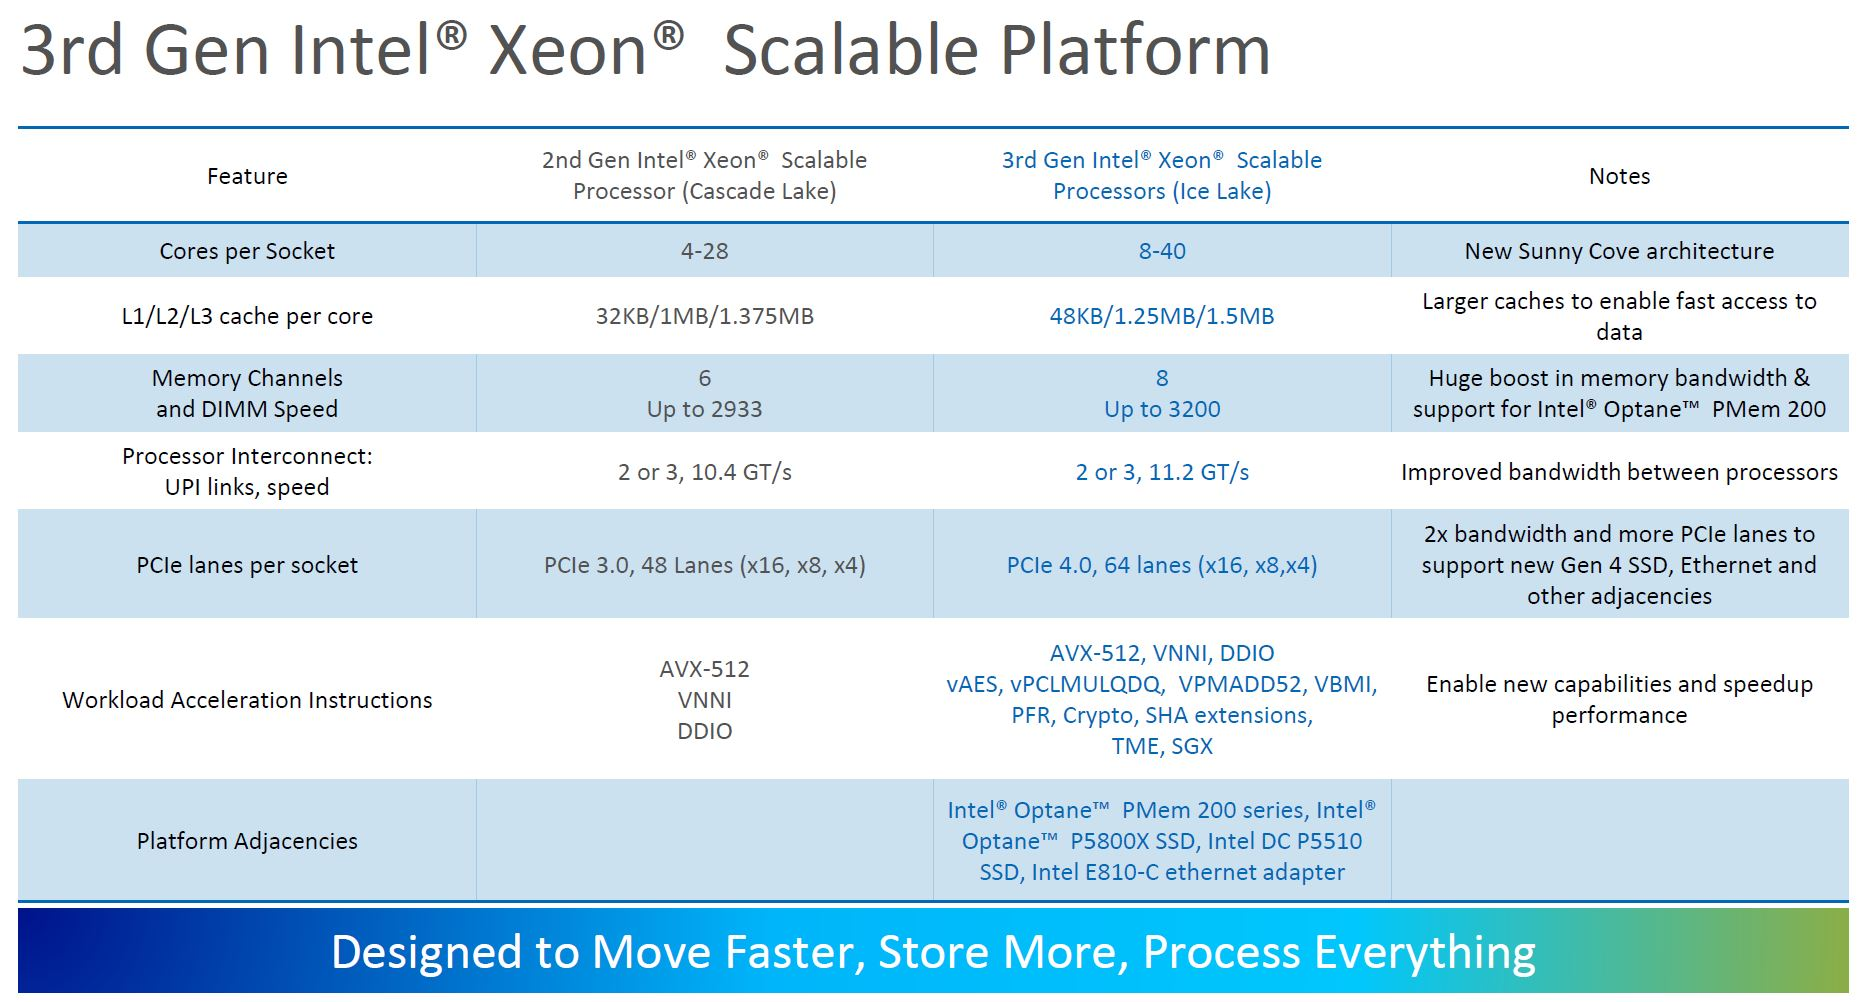 3rd Generation Intel Xeon Scalable Ice Lake Platform 1